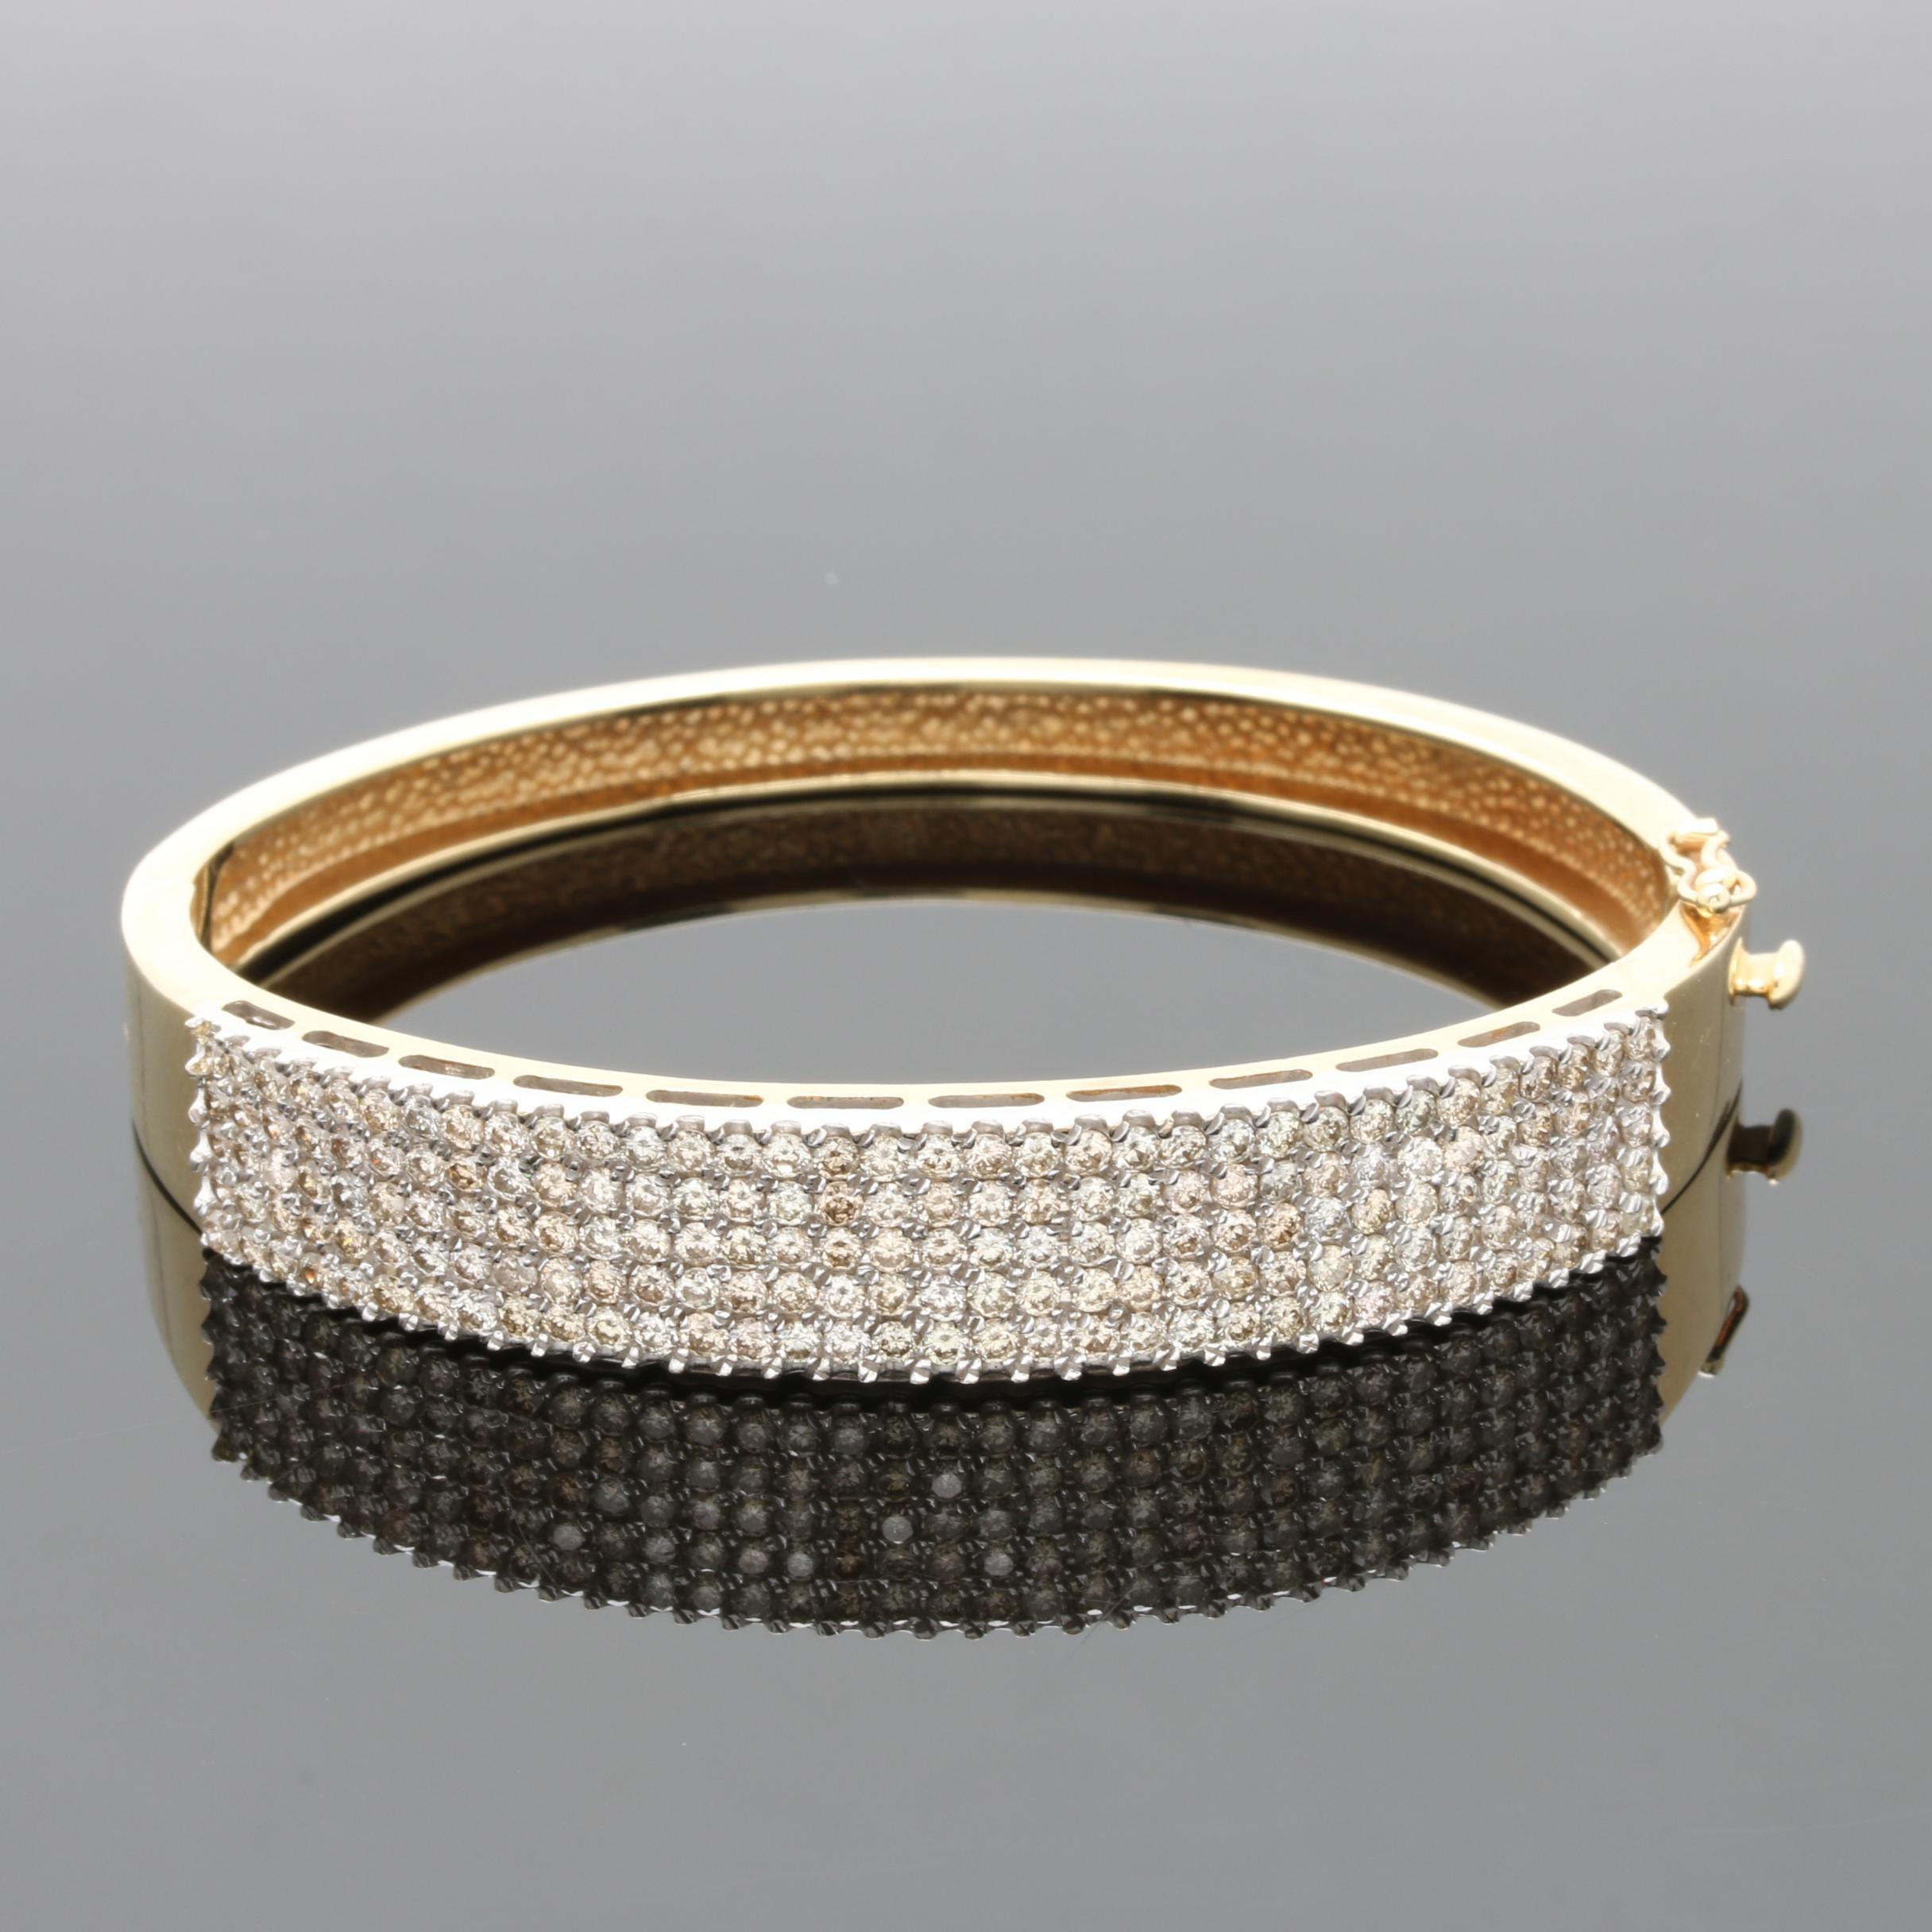 14K Yellow Gold 4.00 CTW Diamond Bangle Bracelet